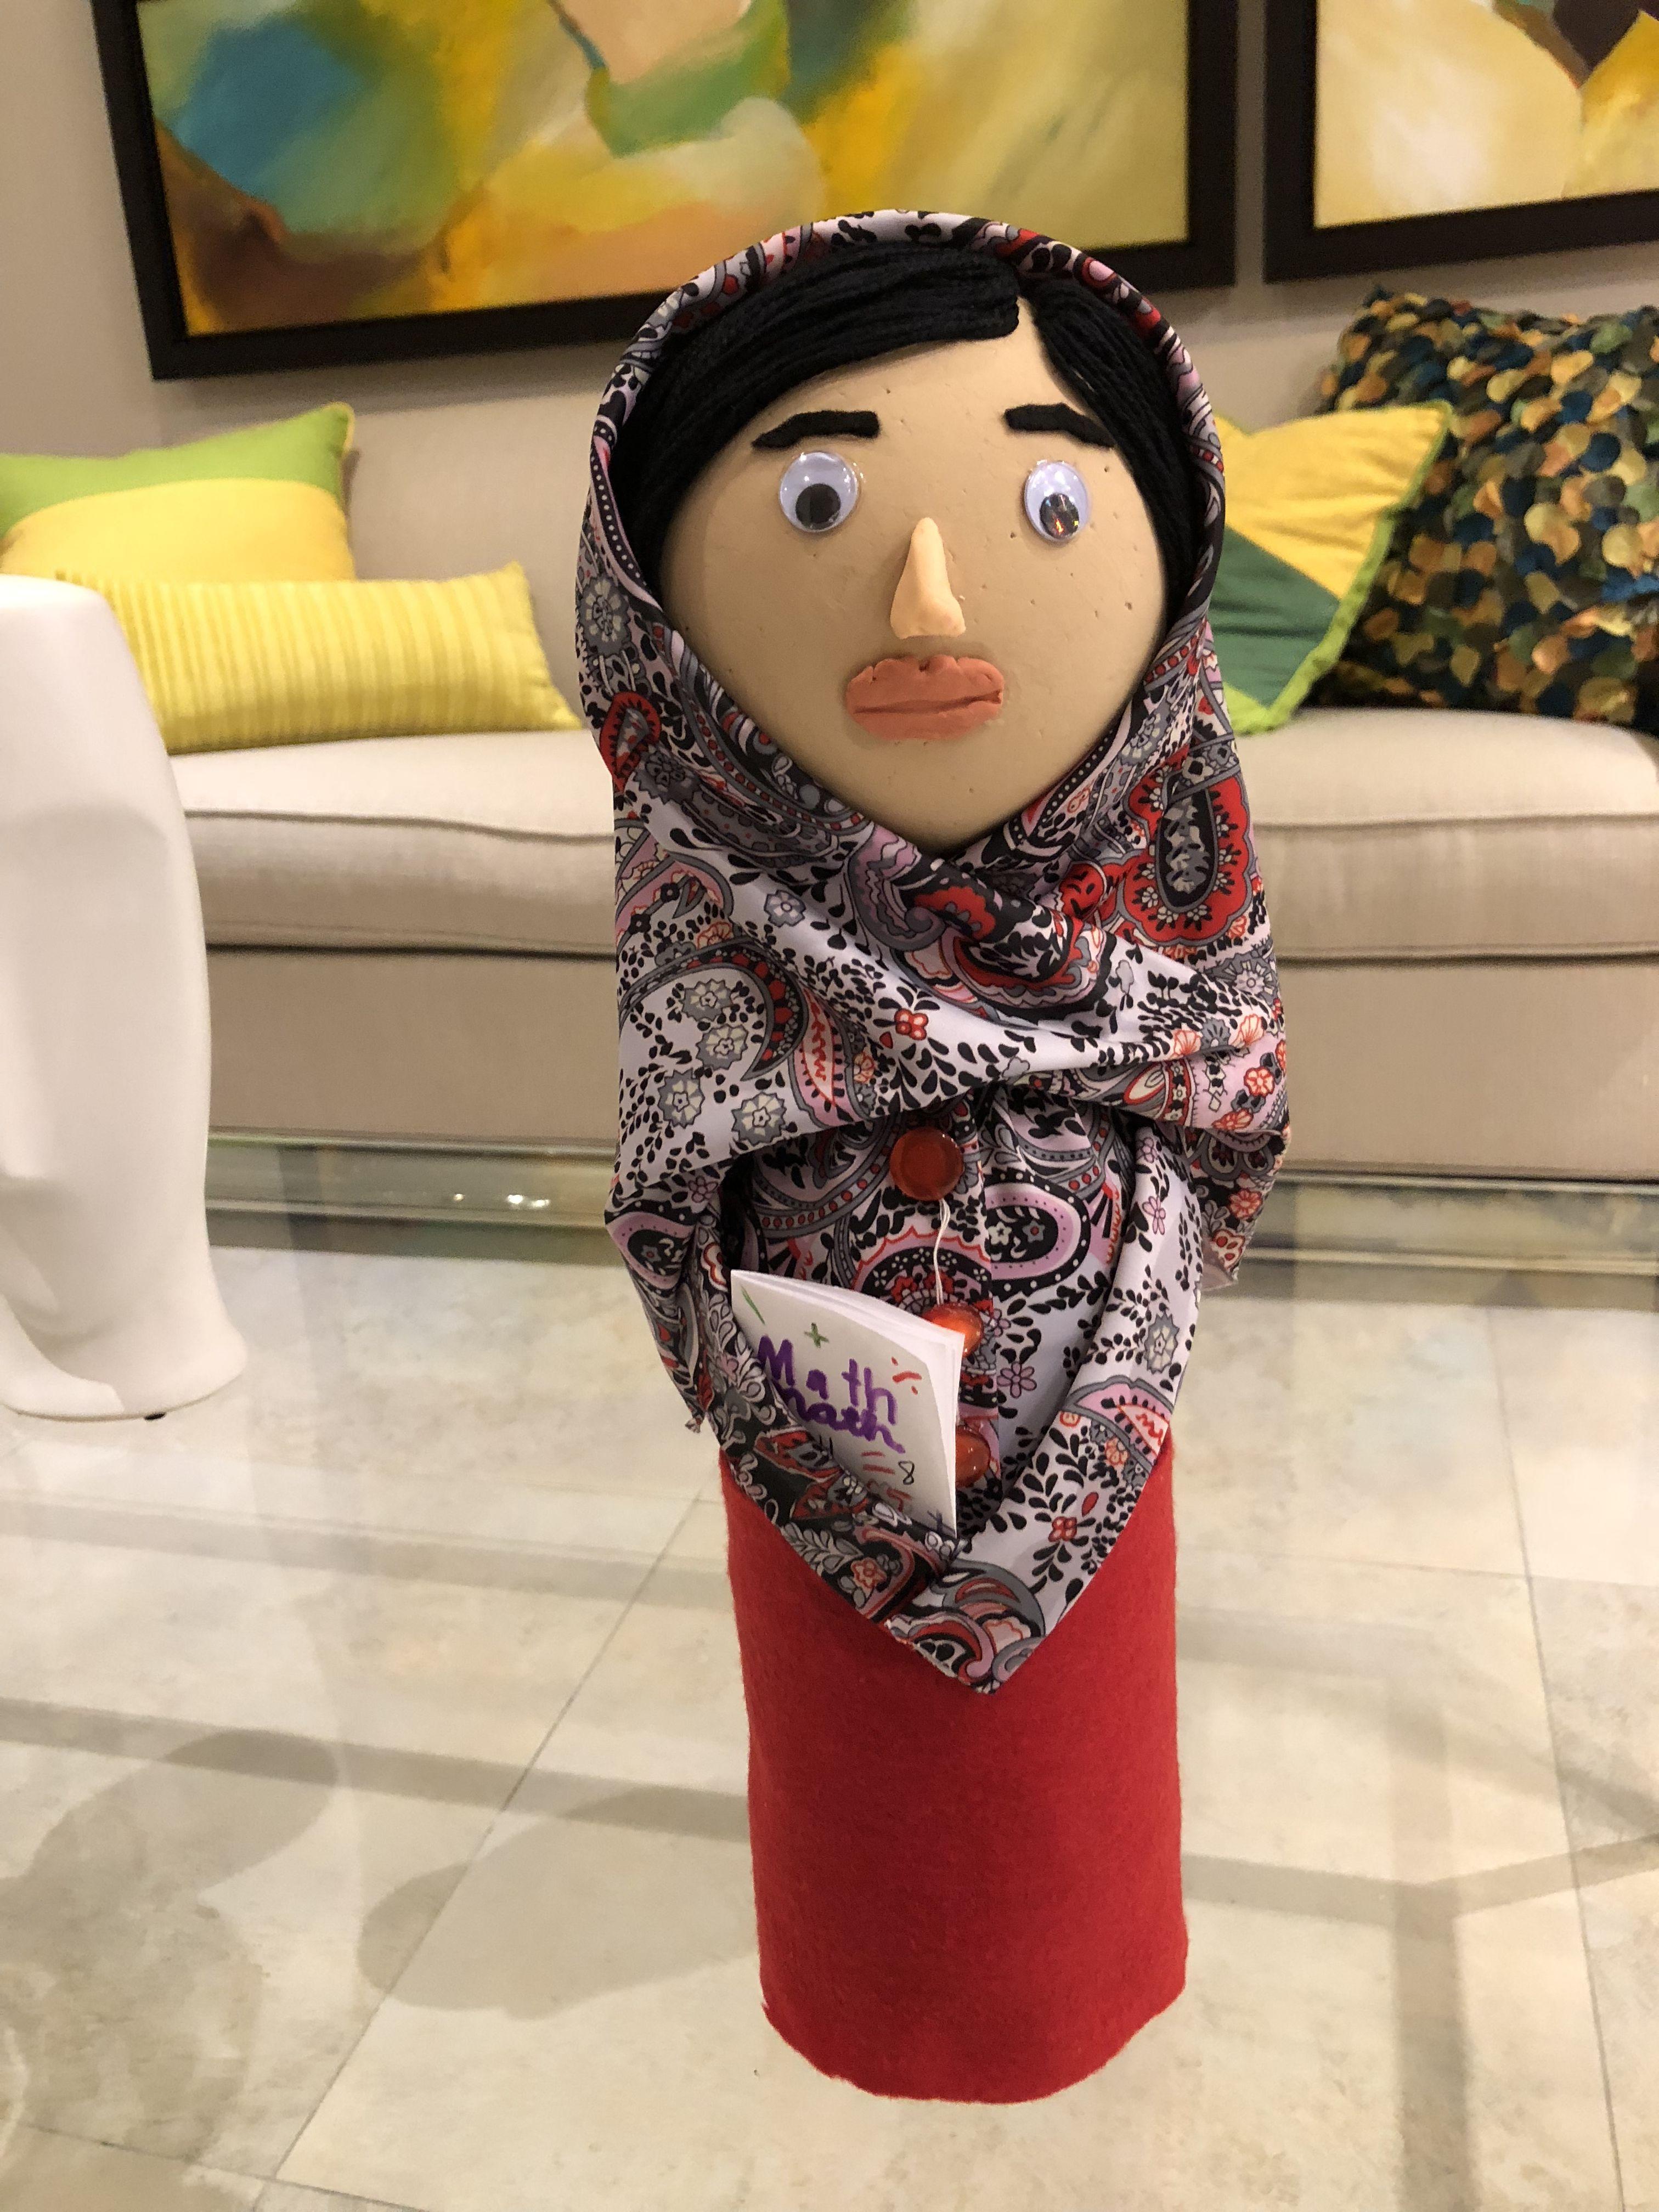 Pin De Ingrid Goncalves Em Projeto Malala Em 2020